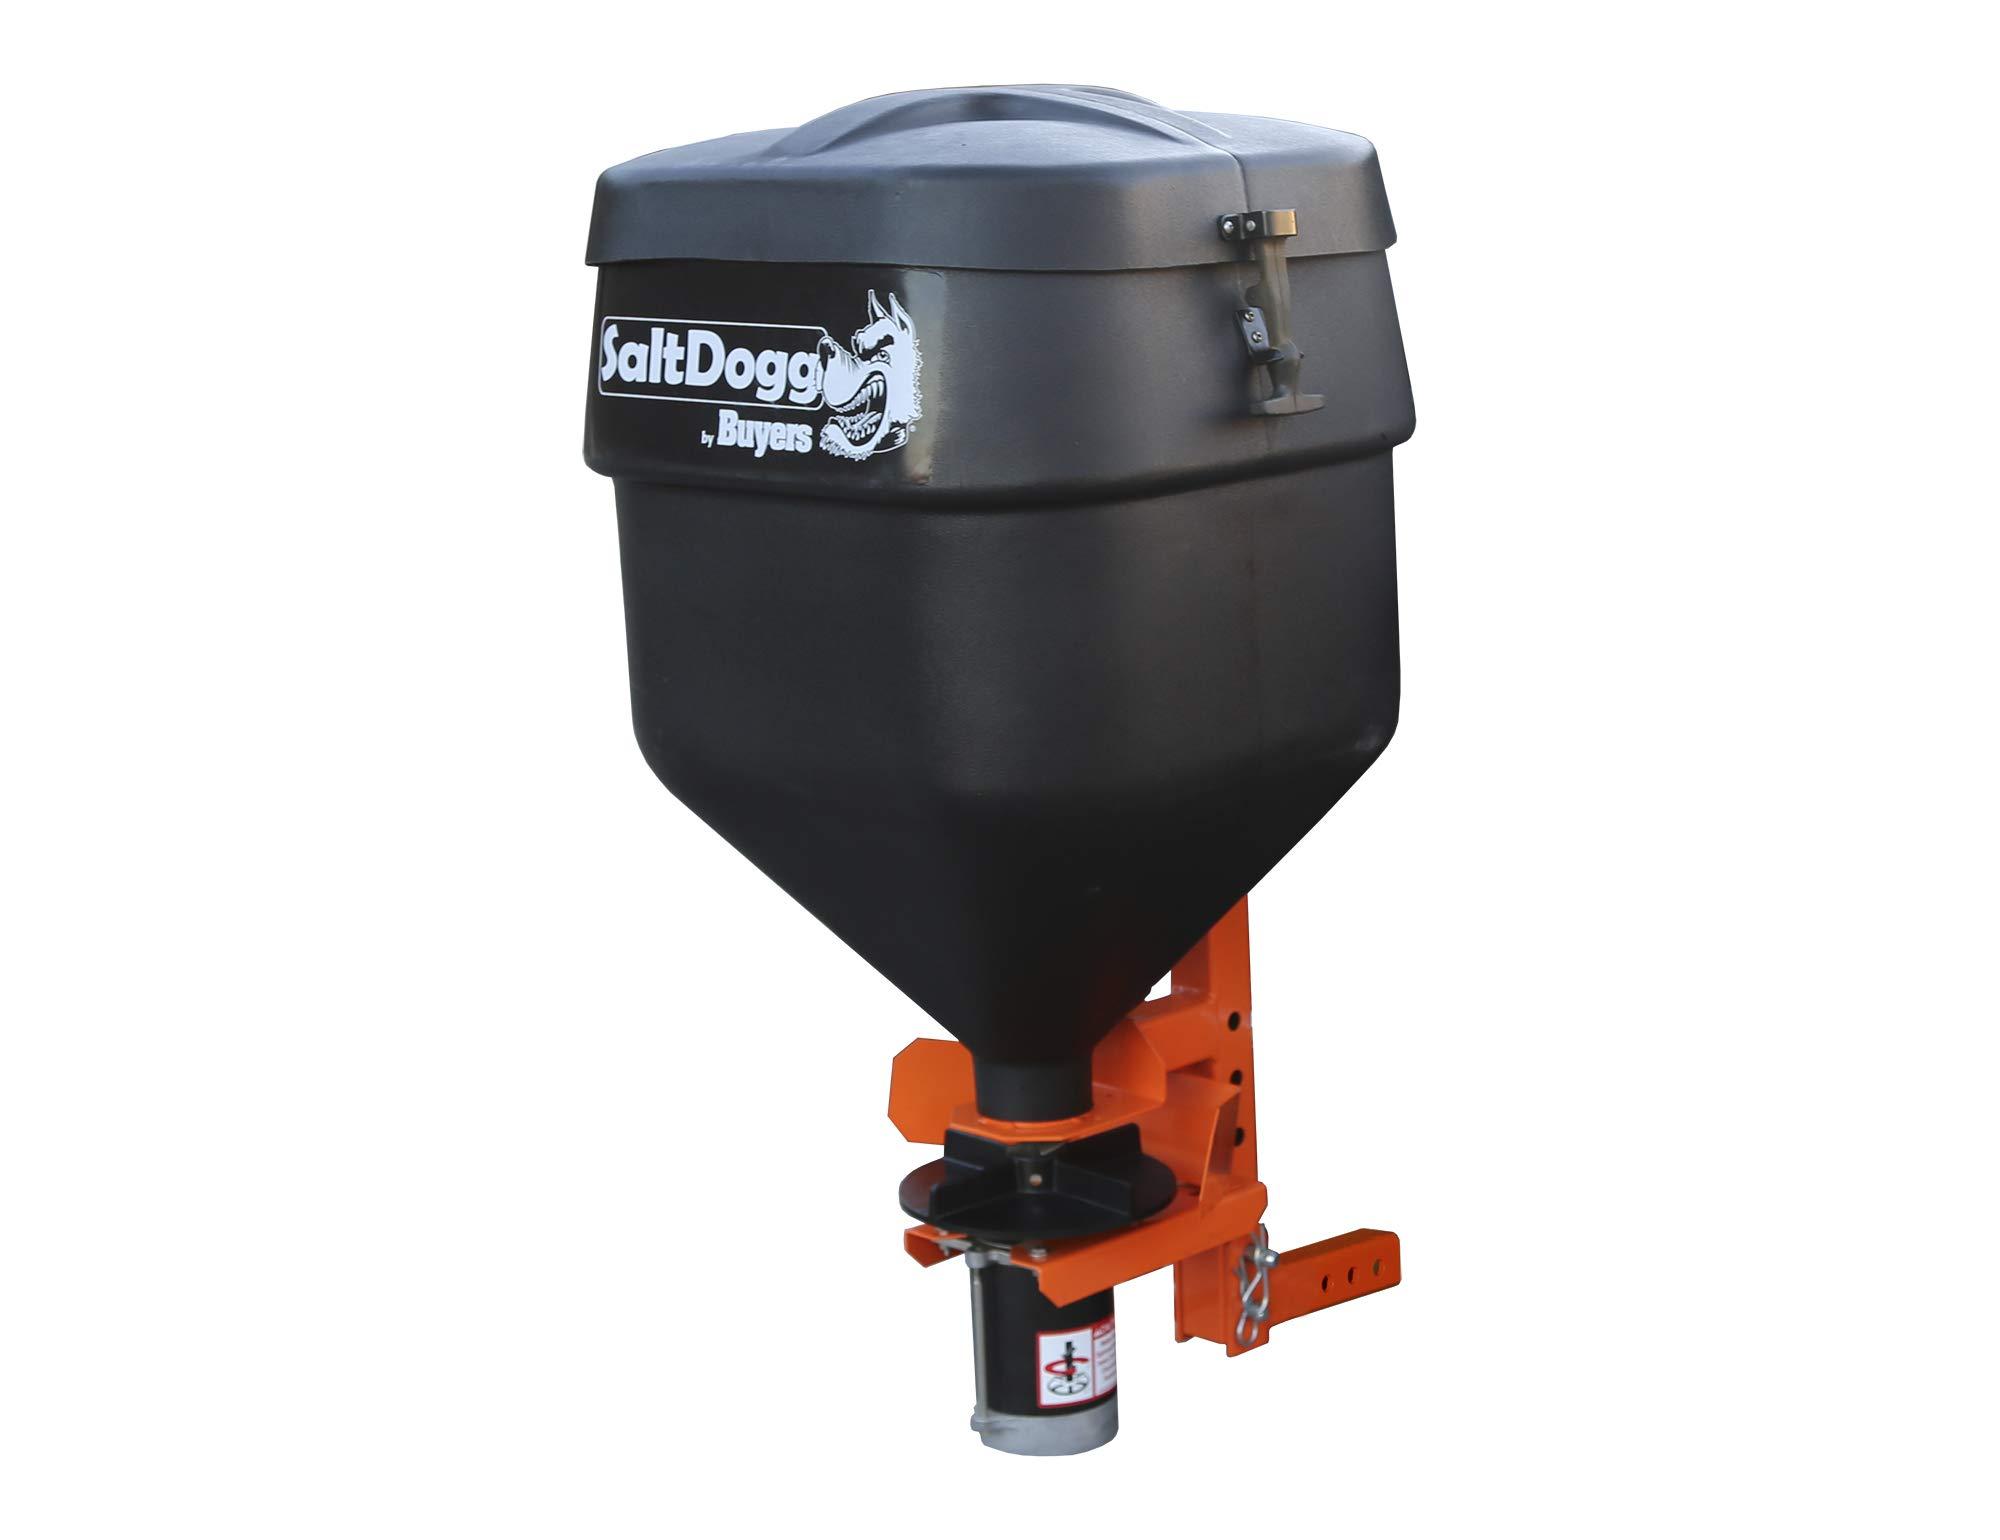 SaltDogg TGSUVPROA Cubic Tailgate Spreader